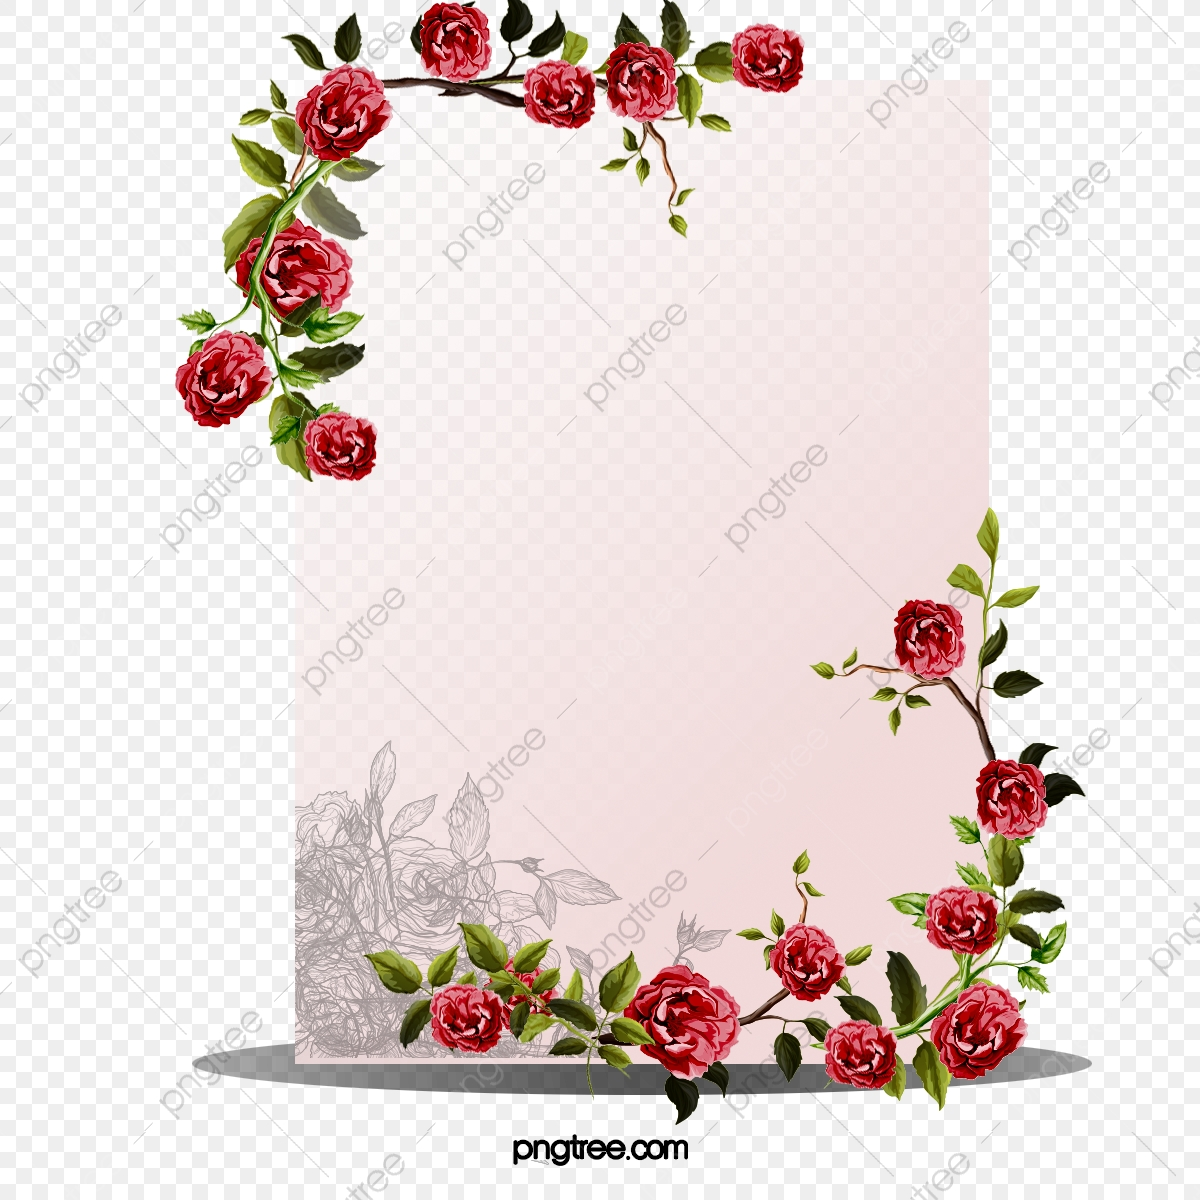 Quadro De Flor Delicada Dos Desenhos Animados Mao Ilustracoes